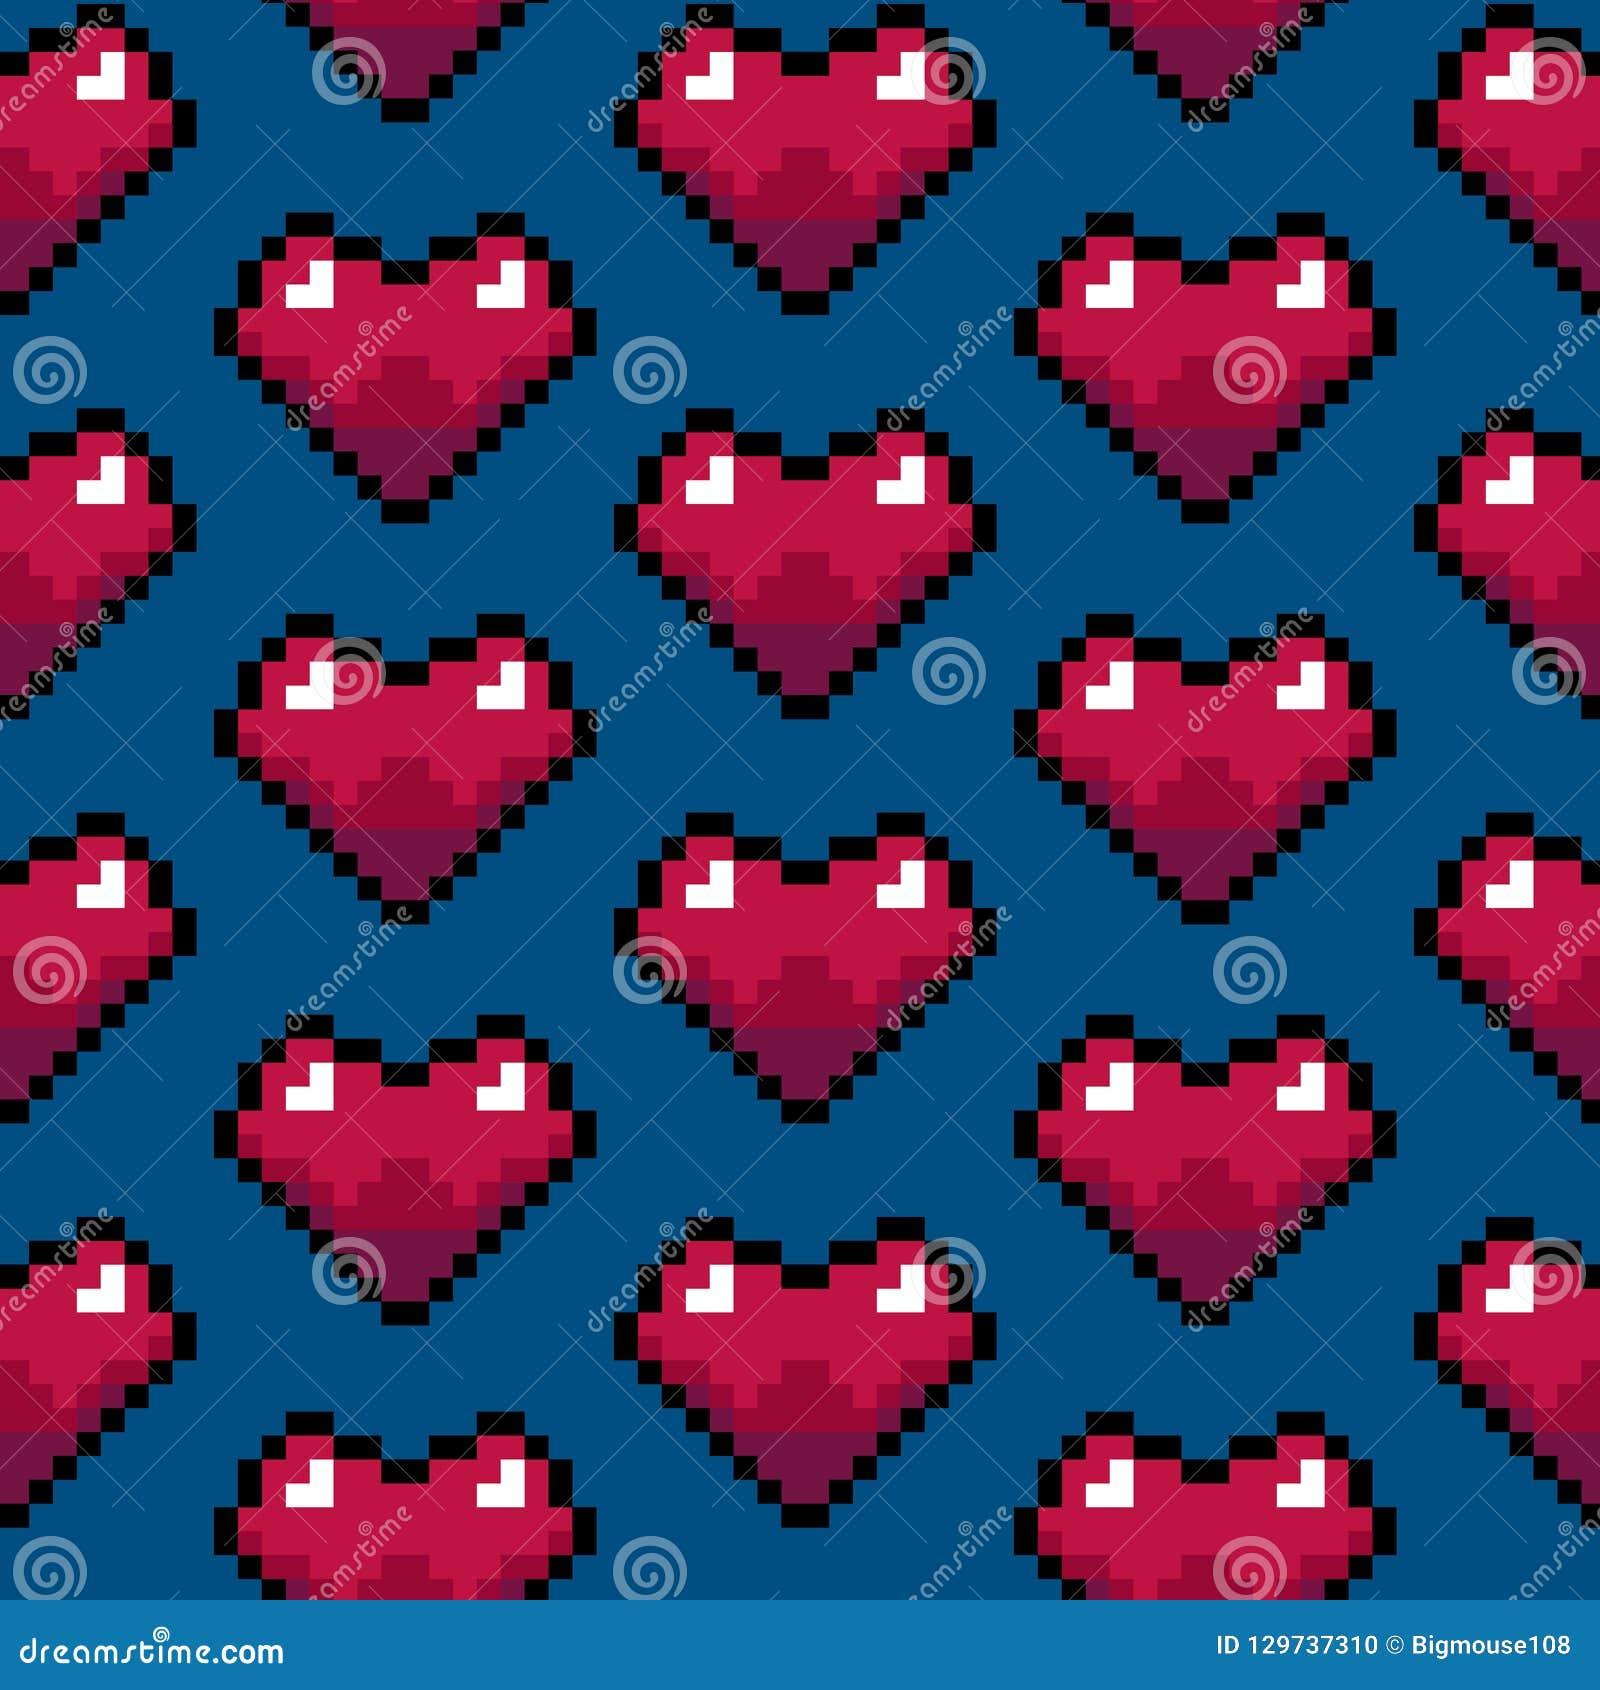 Modele Coeur Pixel Art